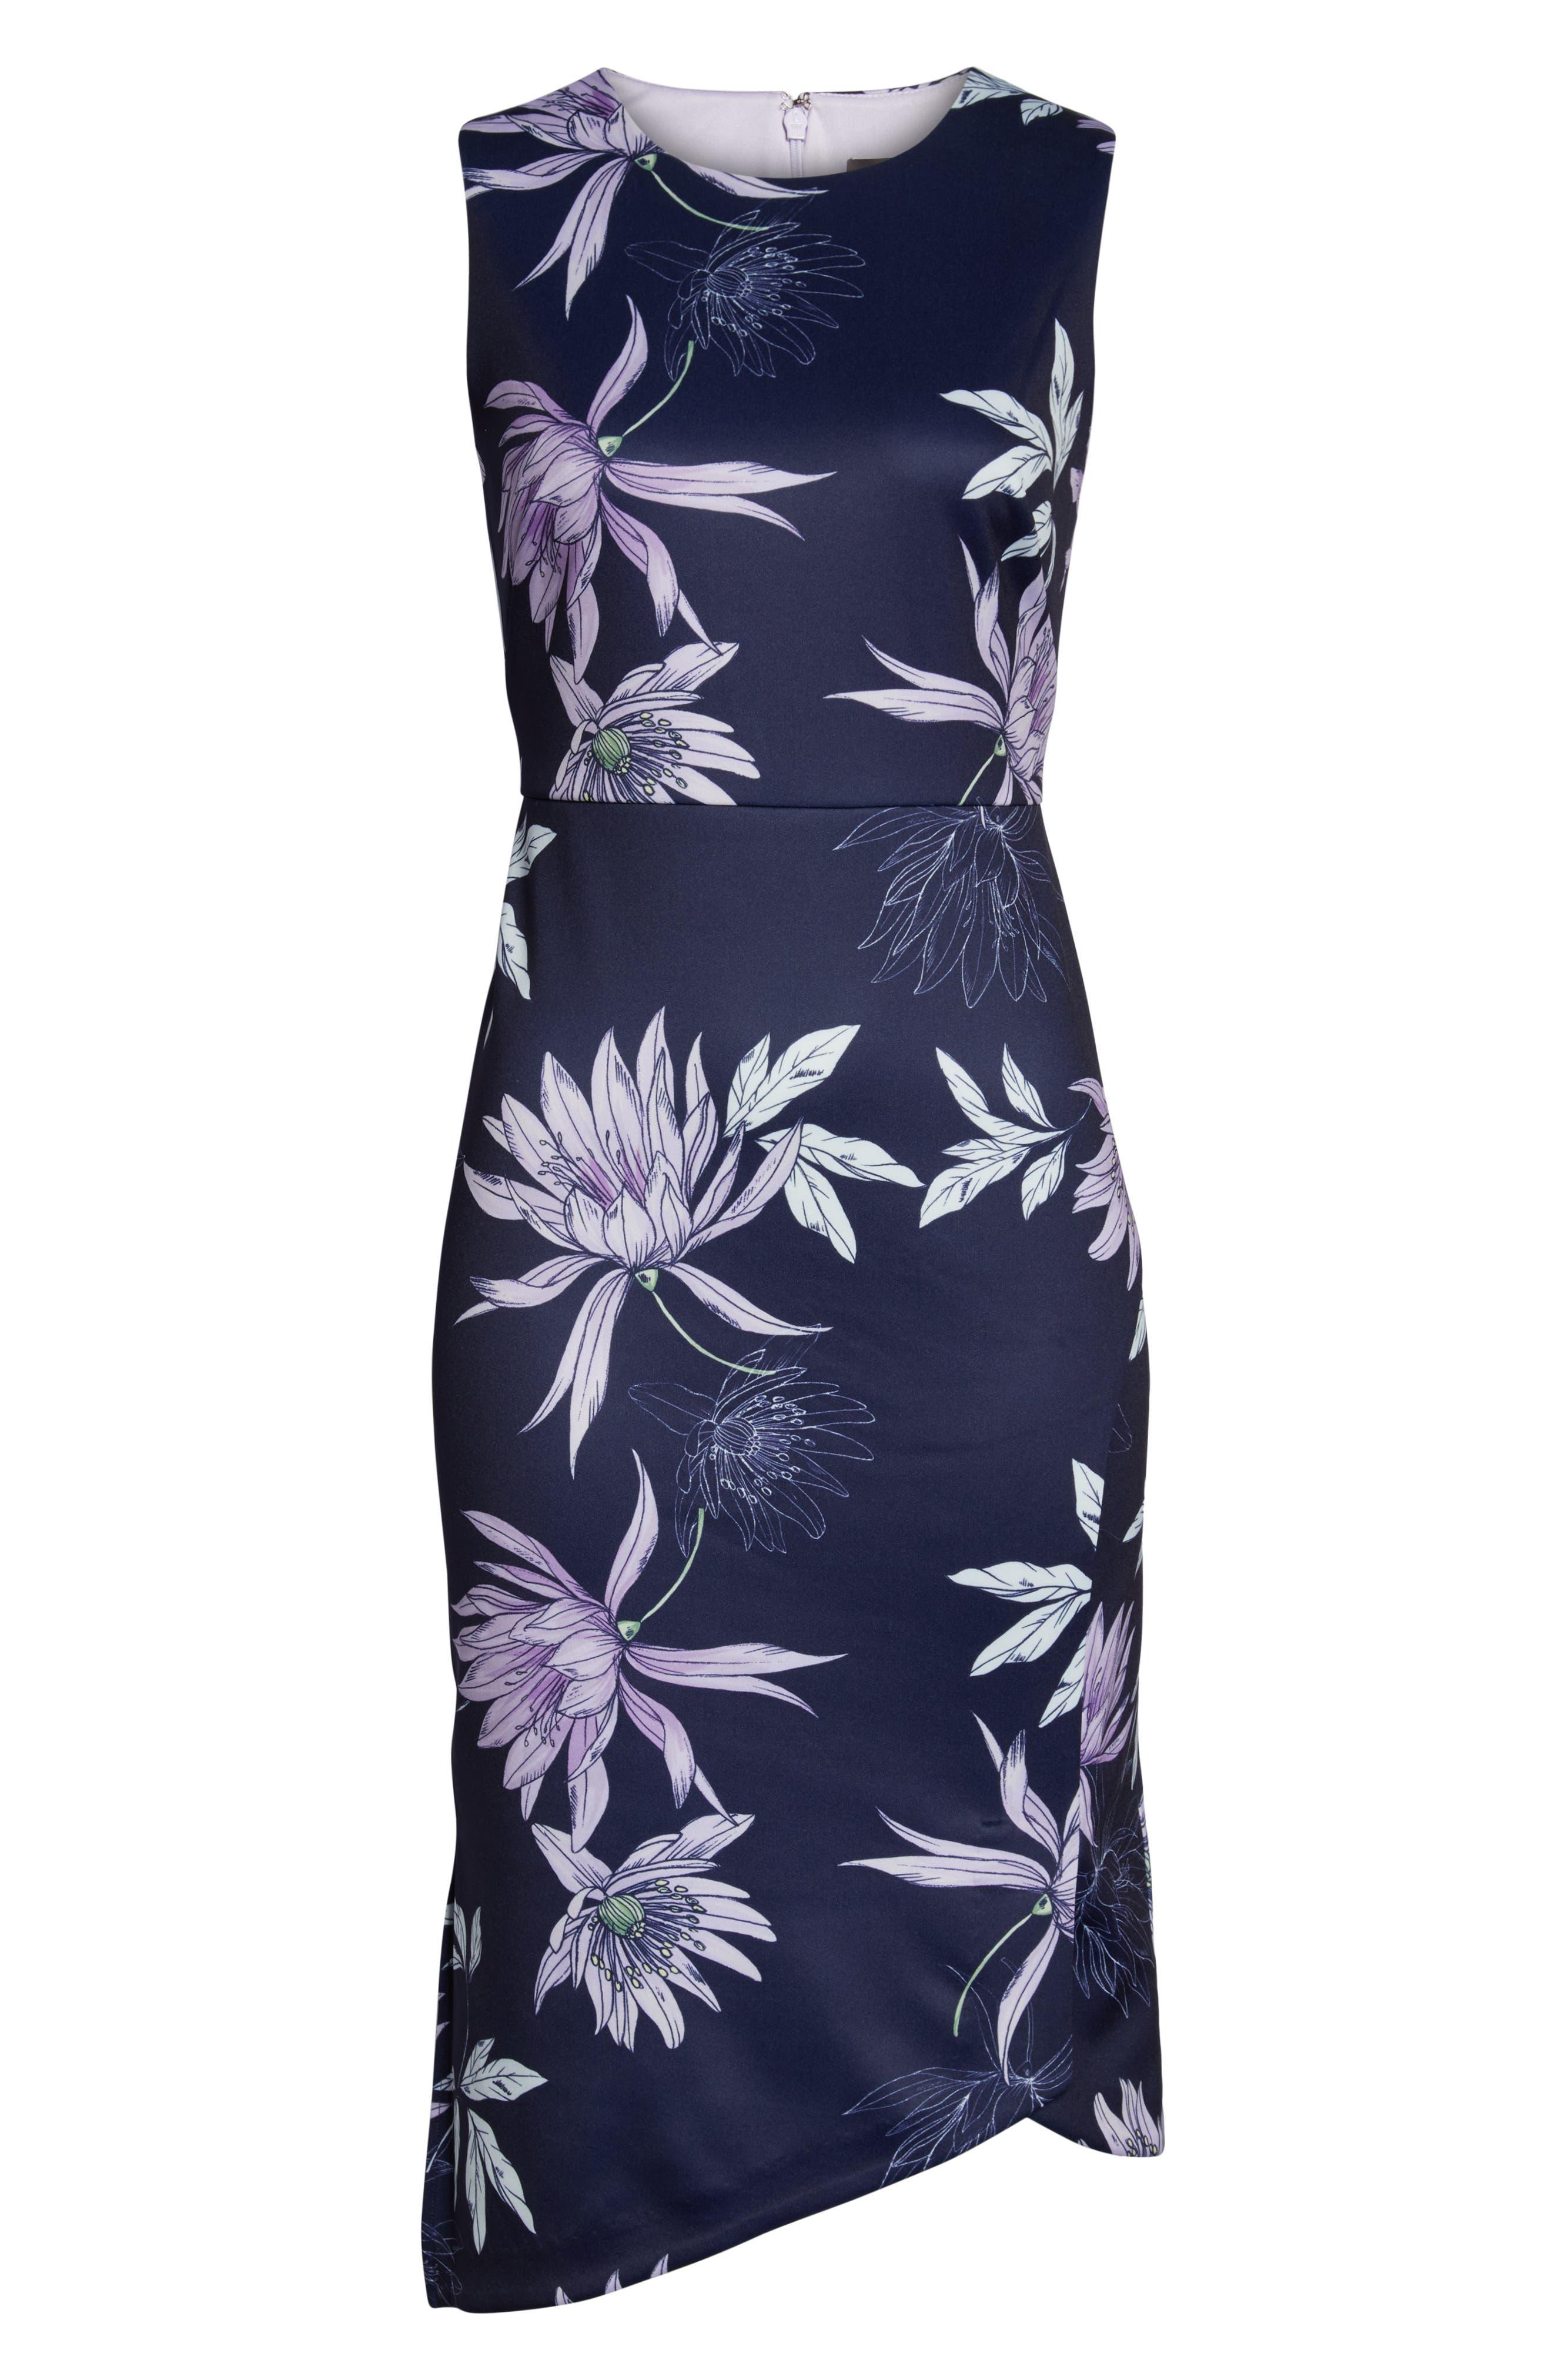 VINCE CAMUTO,                             Floral Print Asymmetrical Hem Dress,                             Alternate thumbnail 7, color,                             NAVY/ MULTI